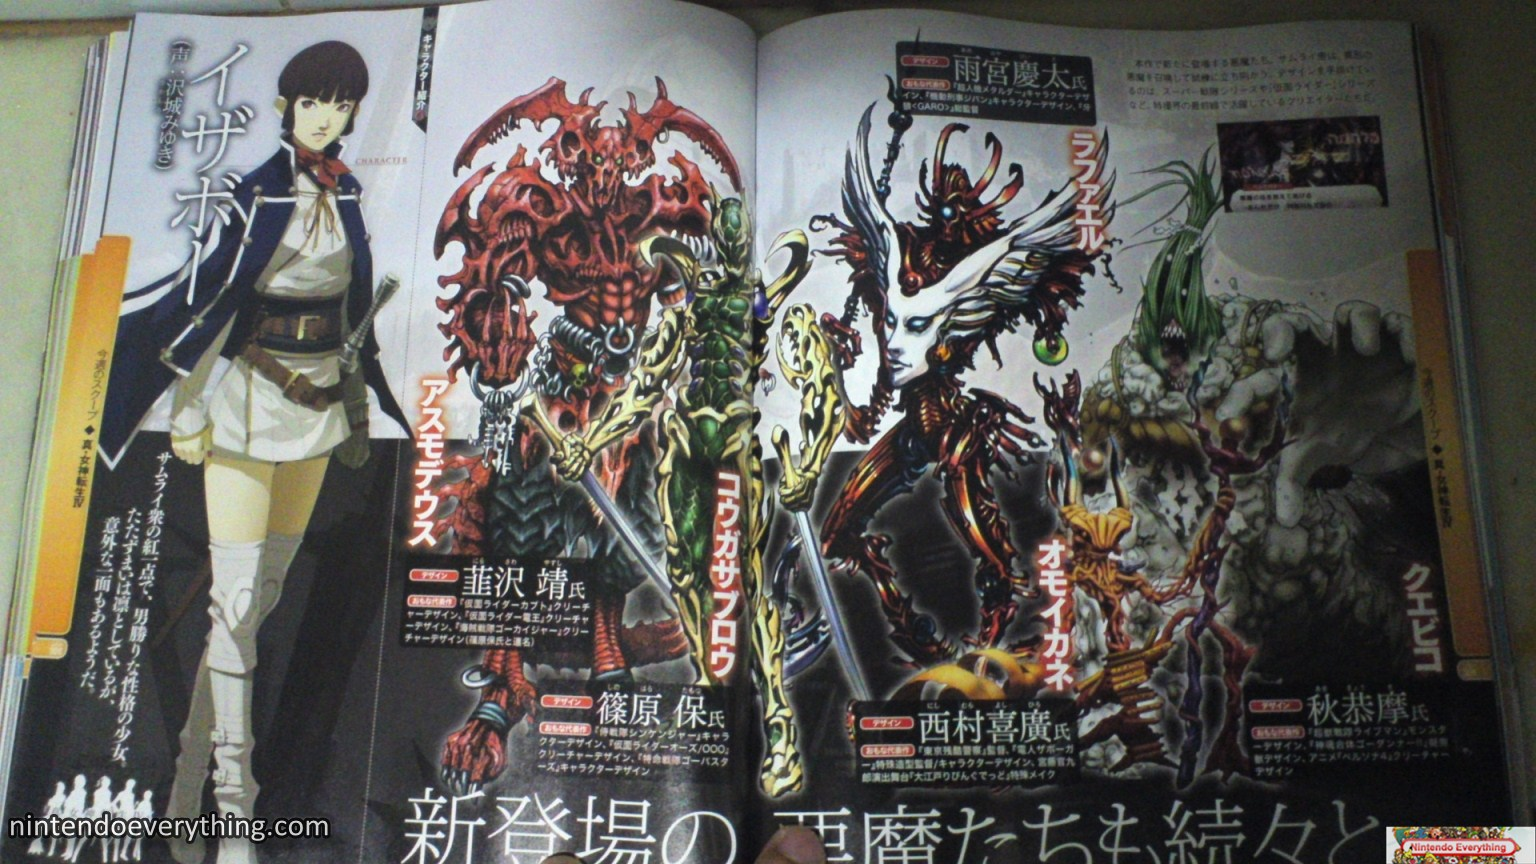 Shin Megami Tensei IV Scans